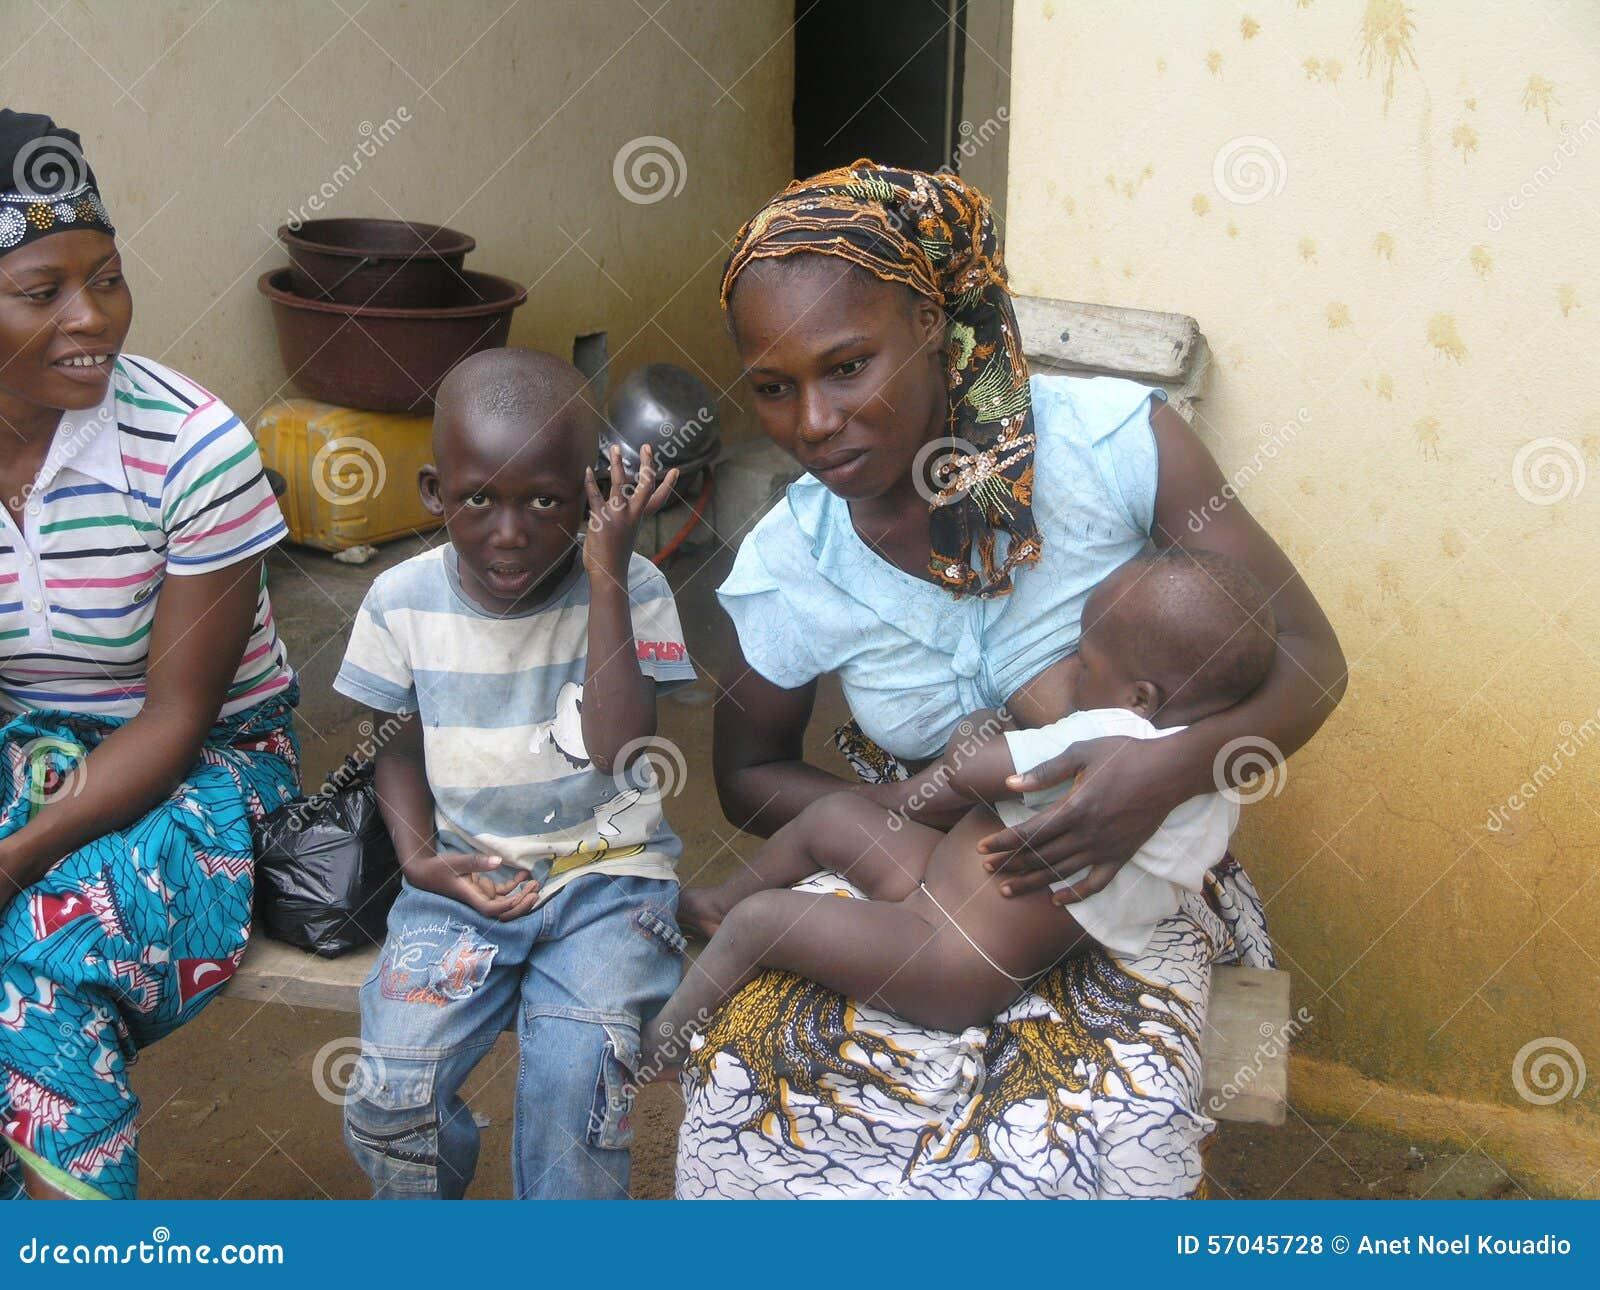 BREASTFEEDING MOTHER Editorial Stock Photo - Image: 57045728